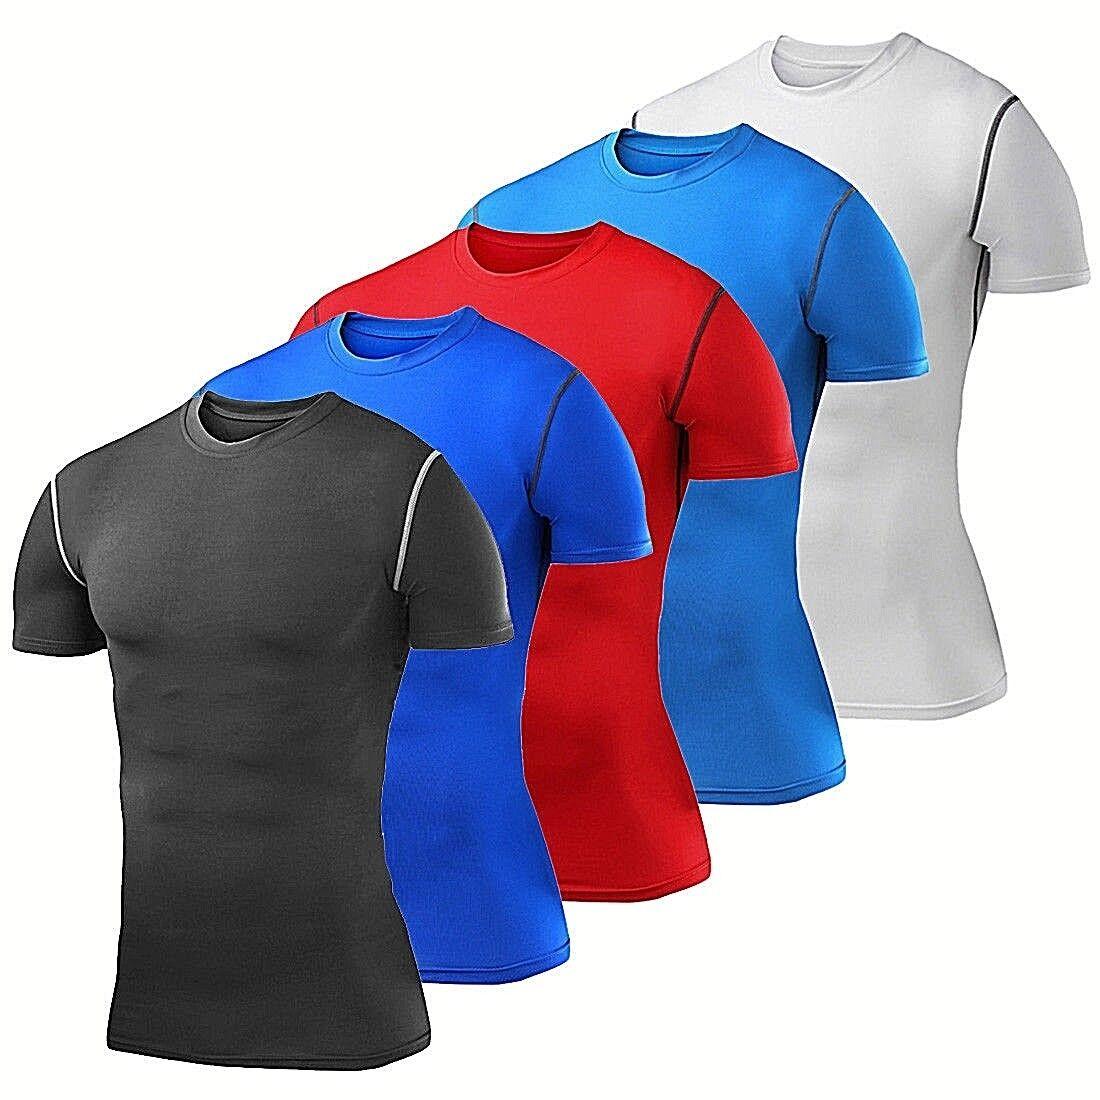 Mens Compression Shirt Short Sleeve Base Layer Workout Cloth